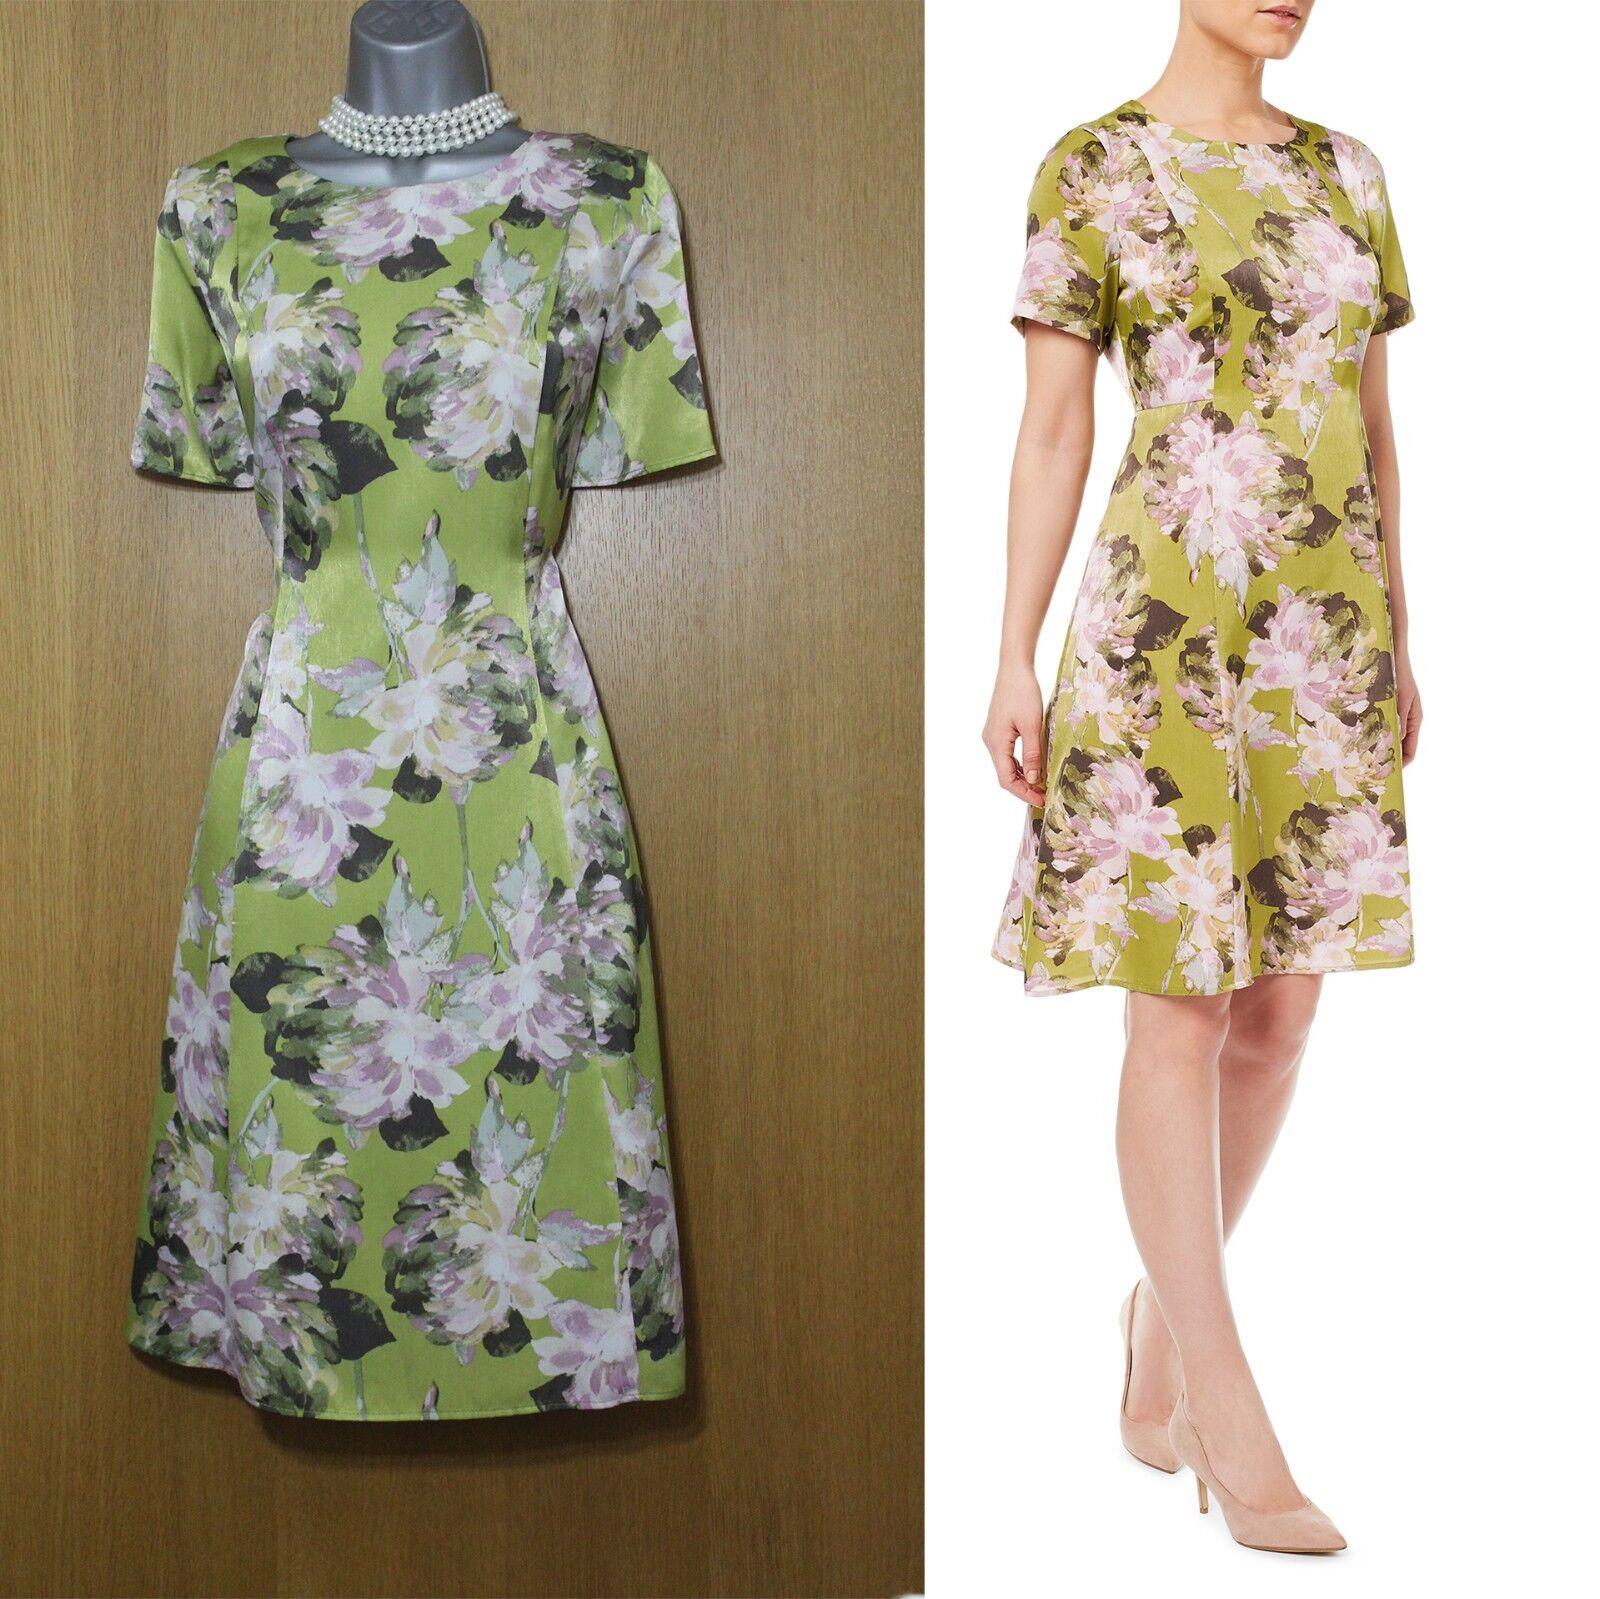 BNWT EASTEX Peony Print Short Sleeves A Line Flattering Dress UK10 EU38 rrp